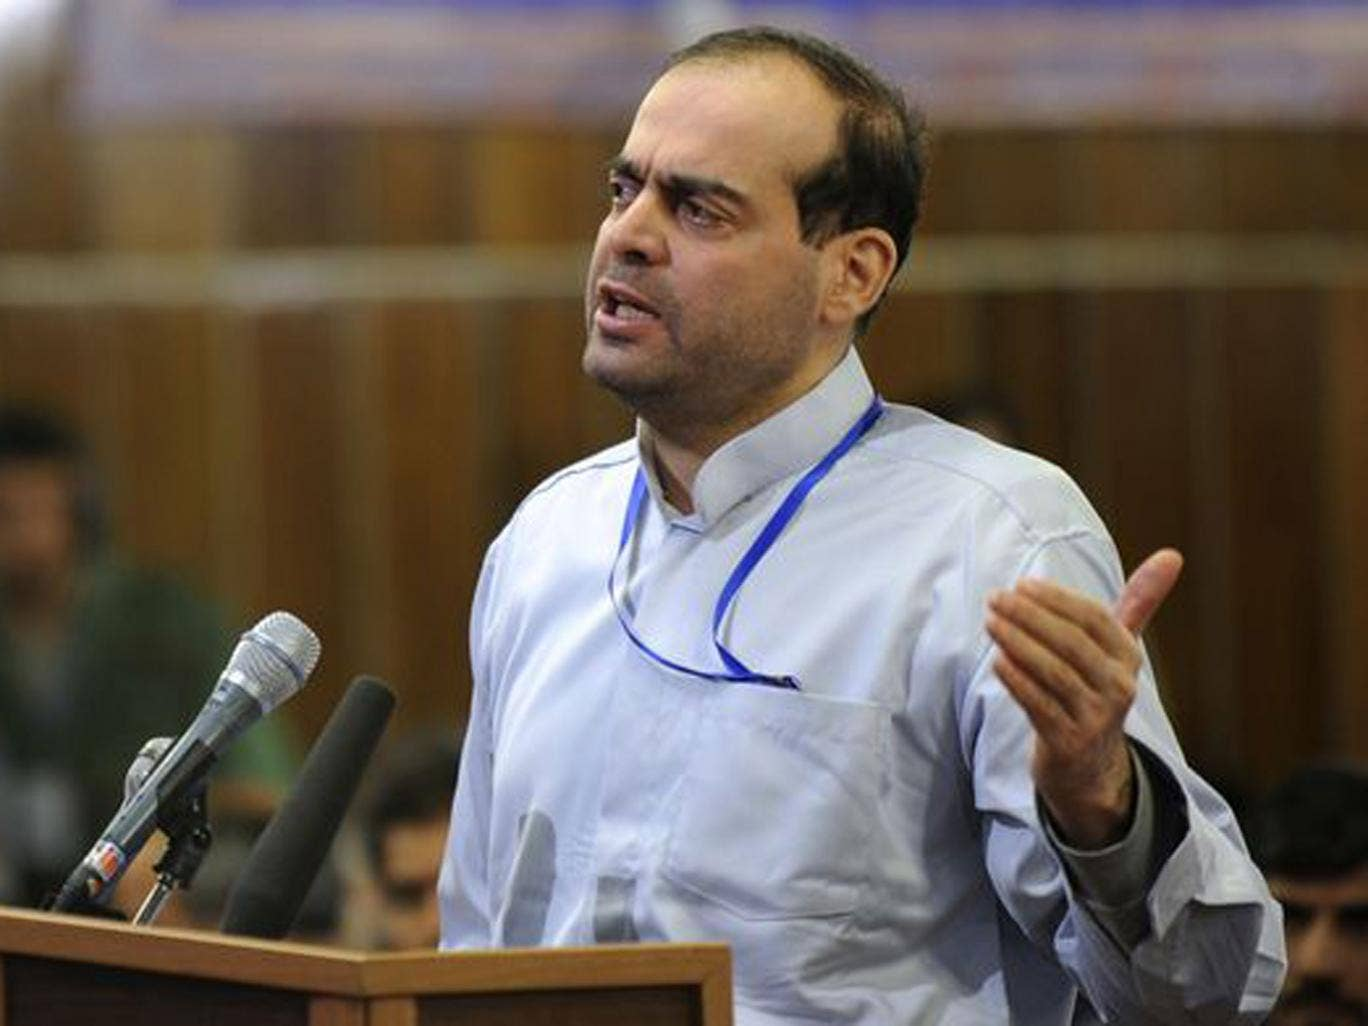 Khosravi standing trial for his £1.5 billion fraud